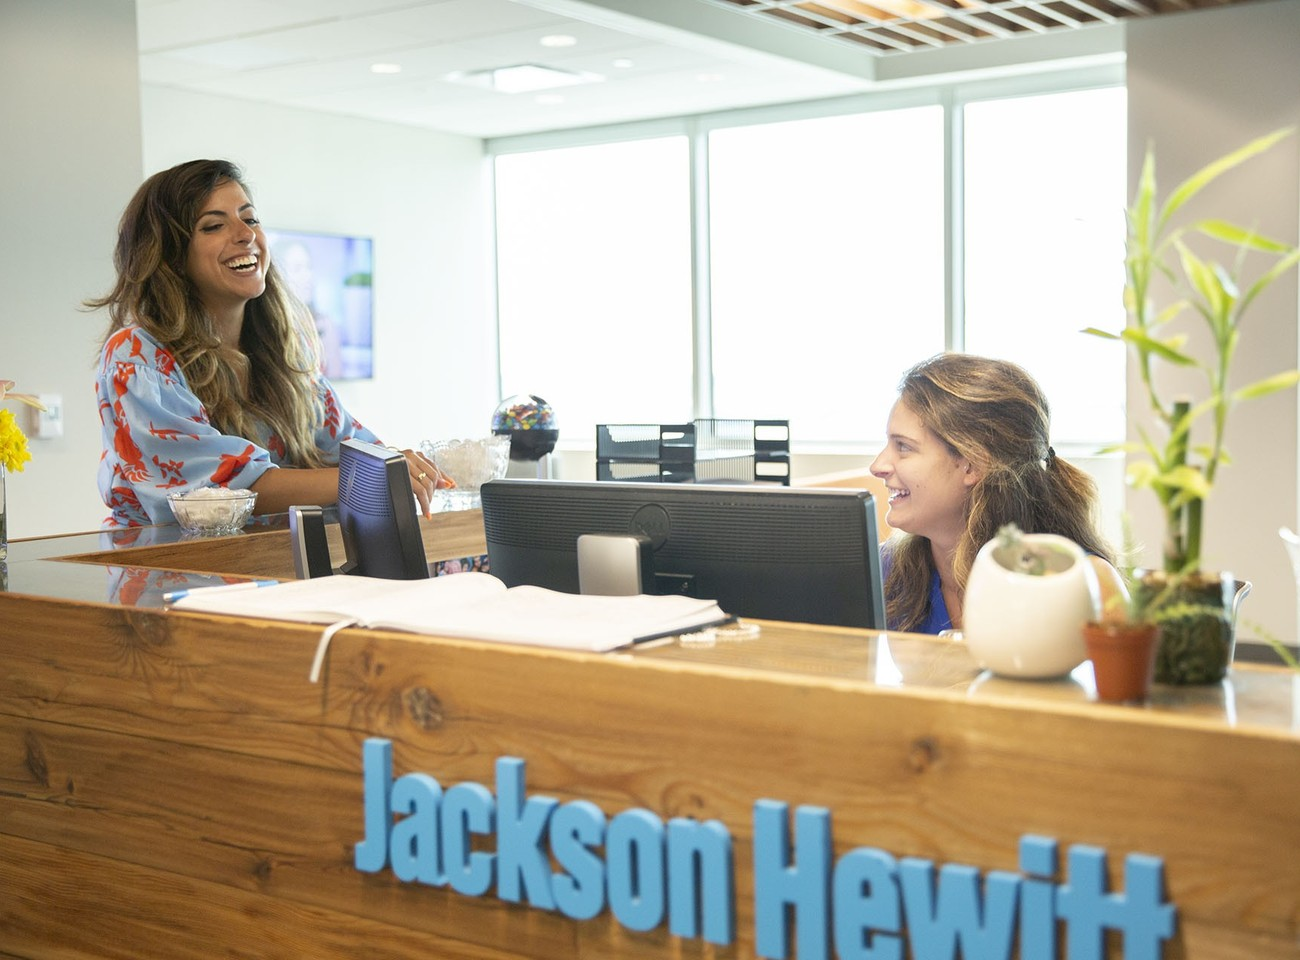 Jackson Hewitt Careers